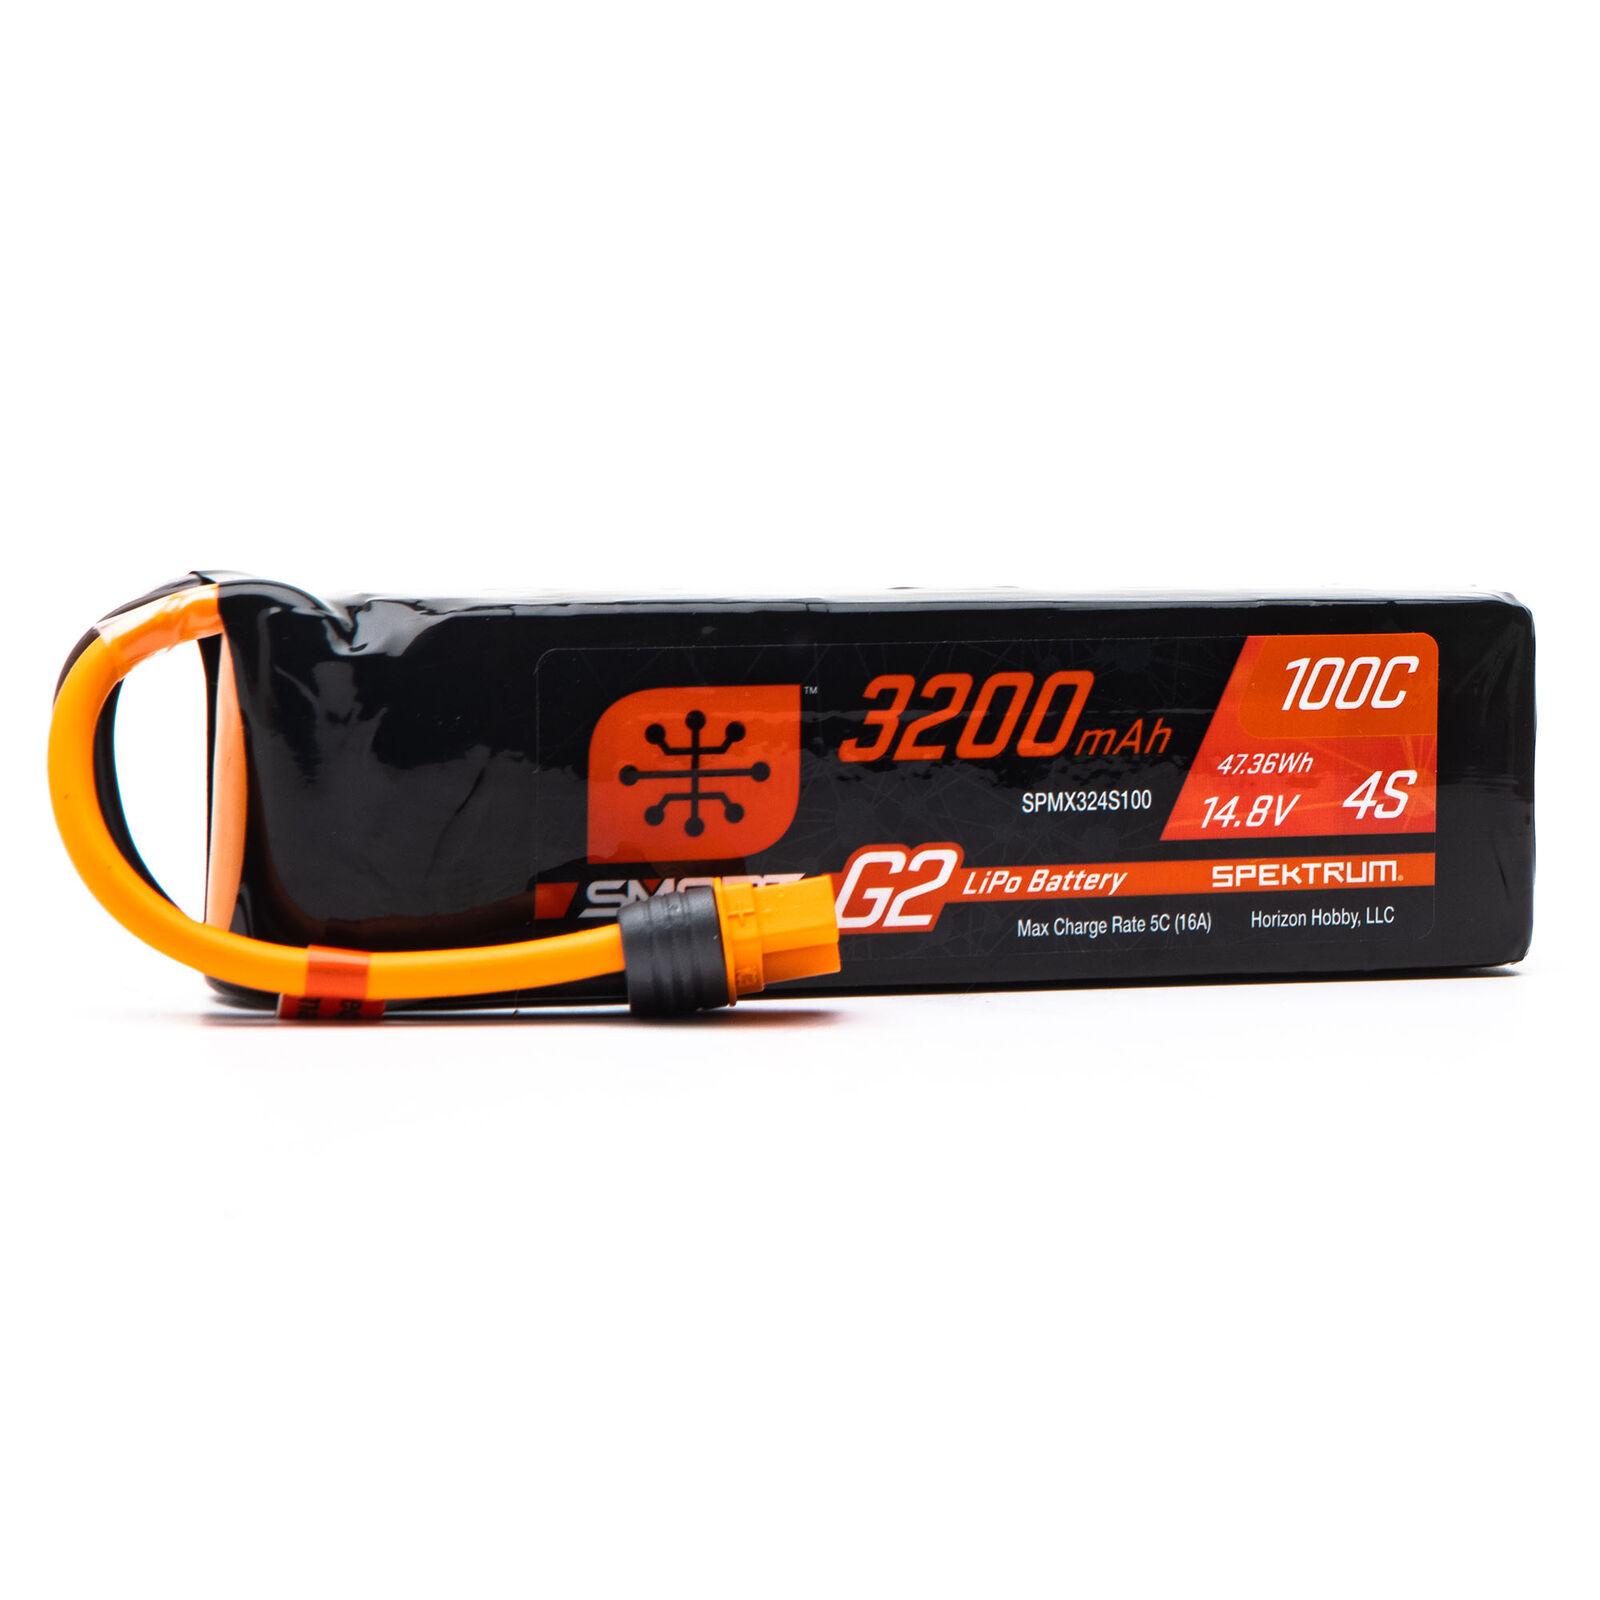 14.8V 3200mAh 4S 100C Smart G2 LiPo Battery: IC3